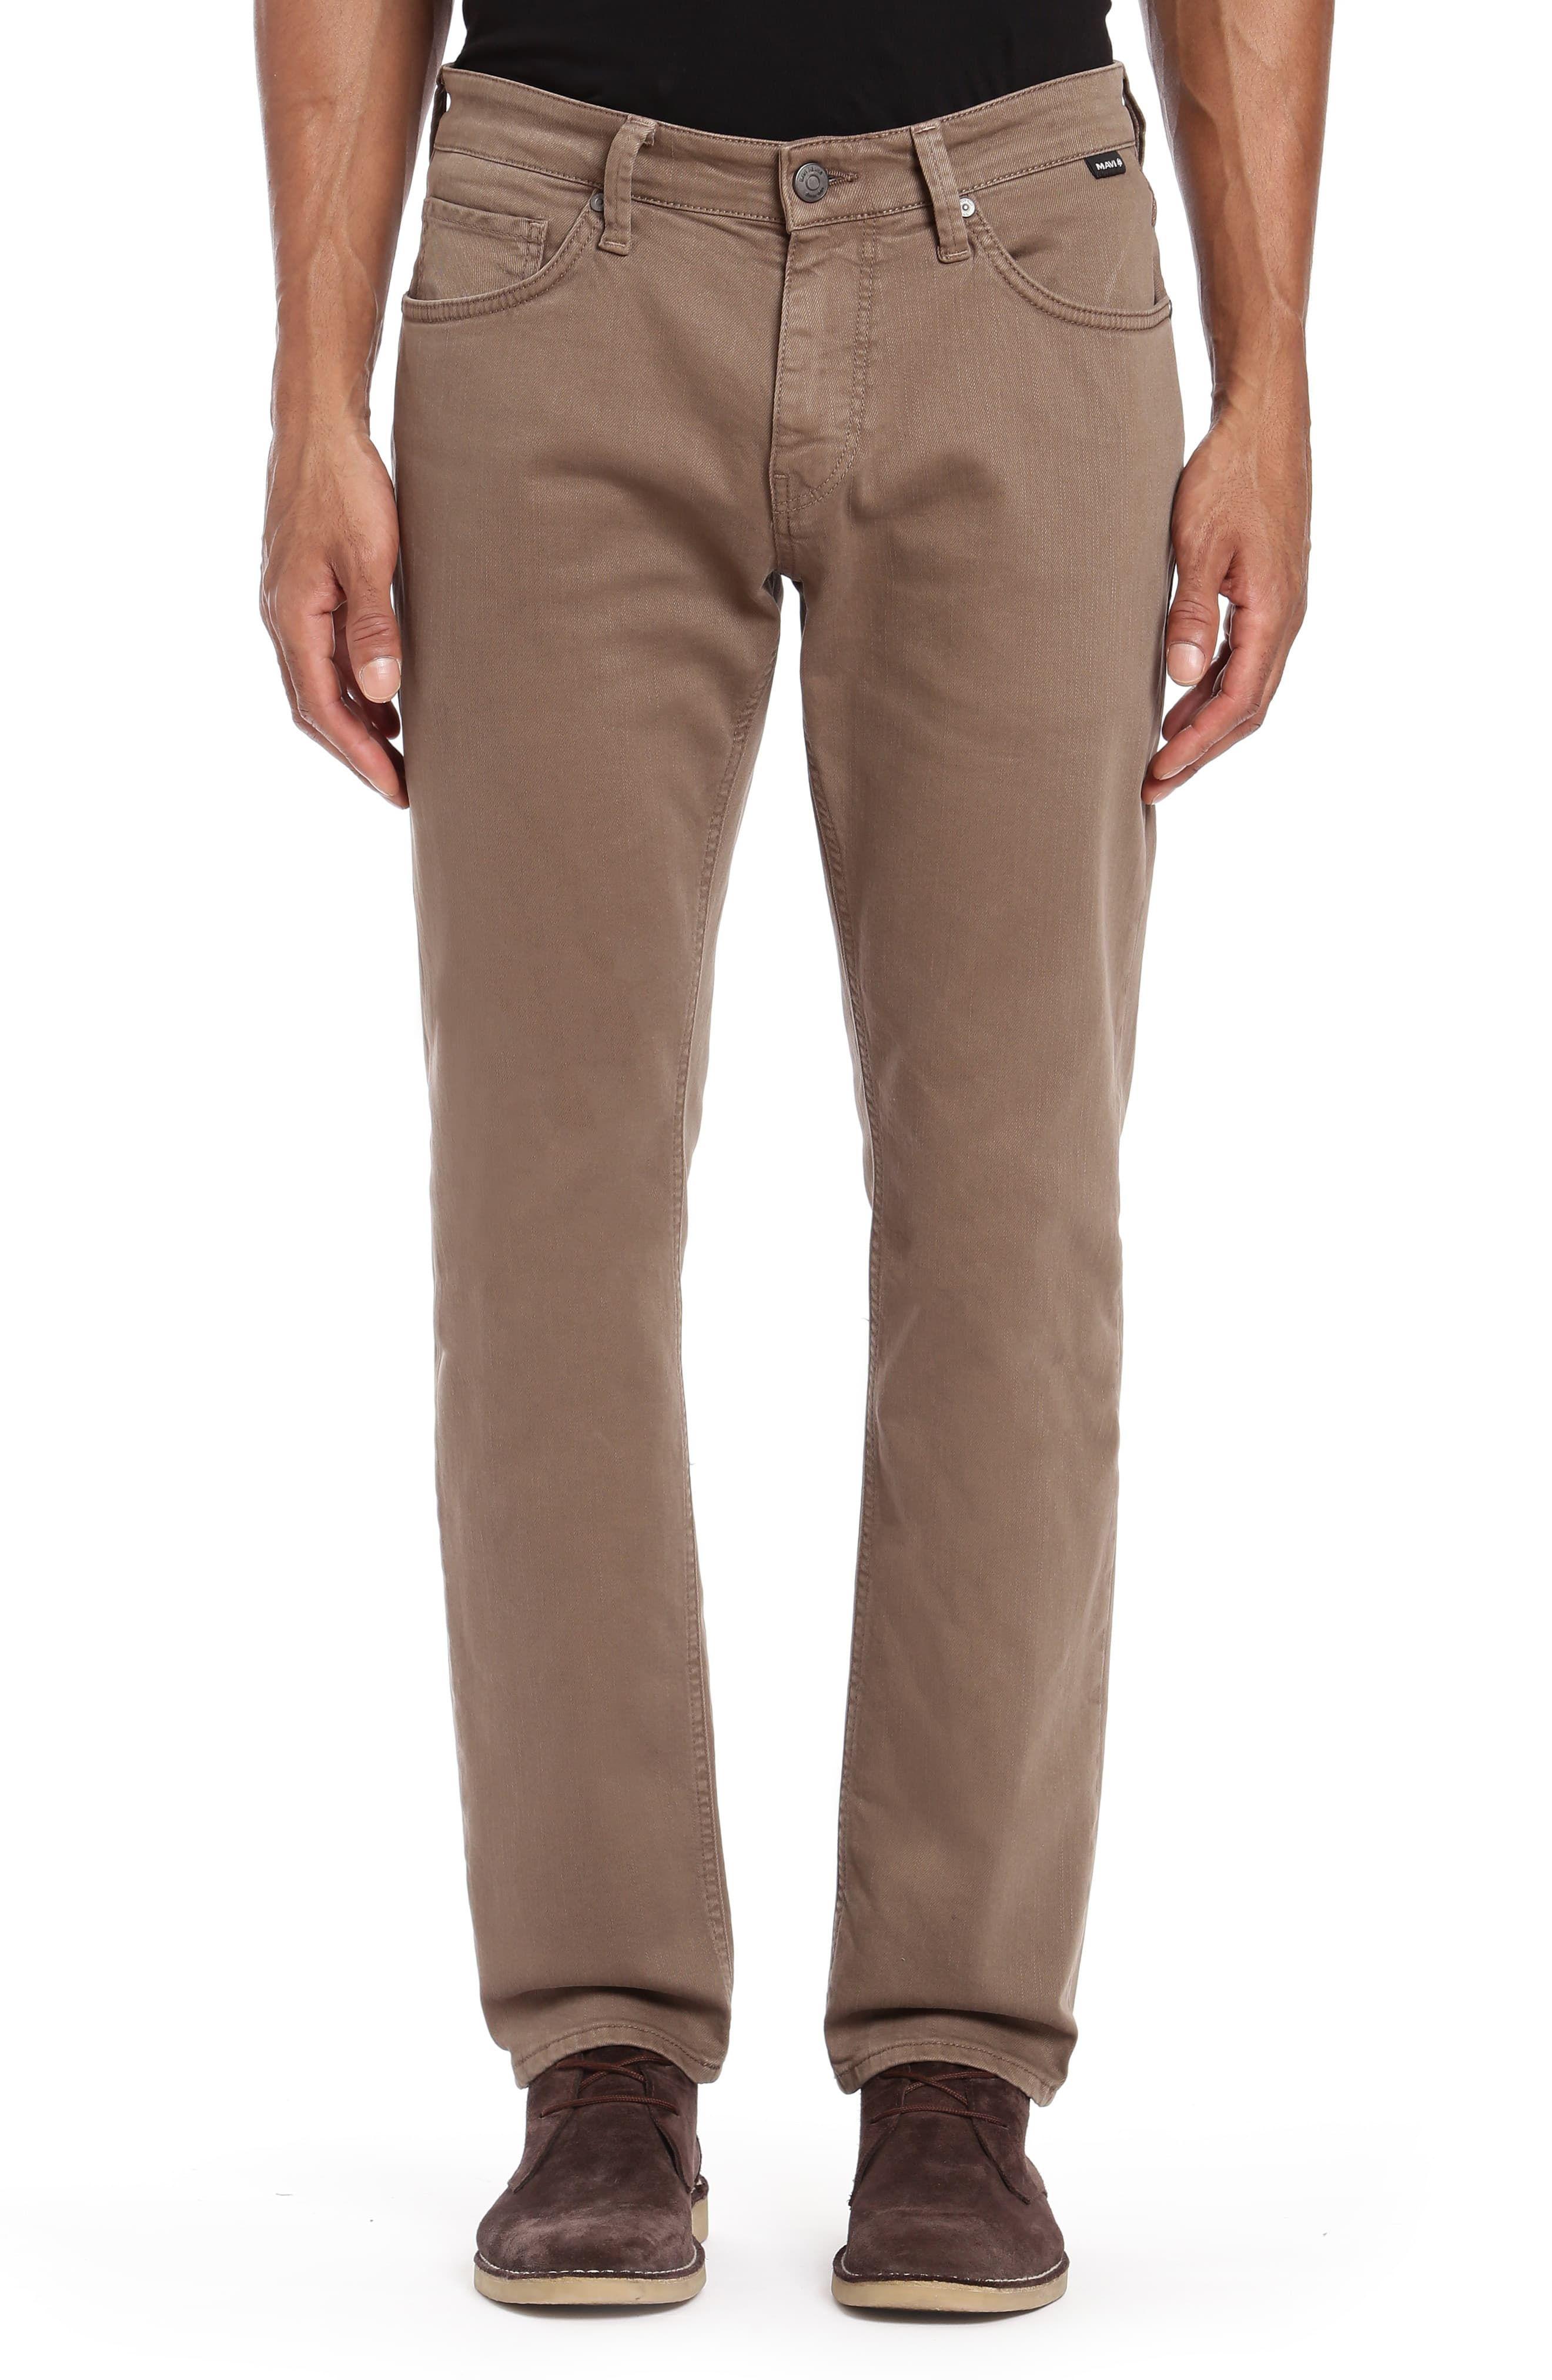 Mavi Jeans Jake Slim Fit Jeans (Coffee Comfort Slim